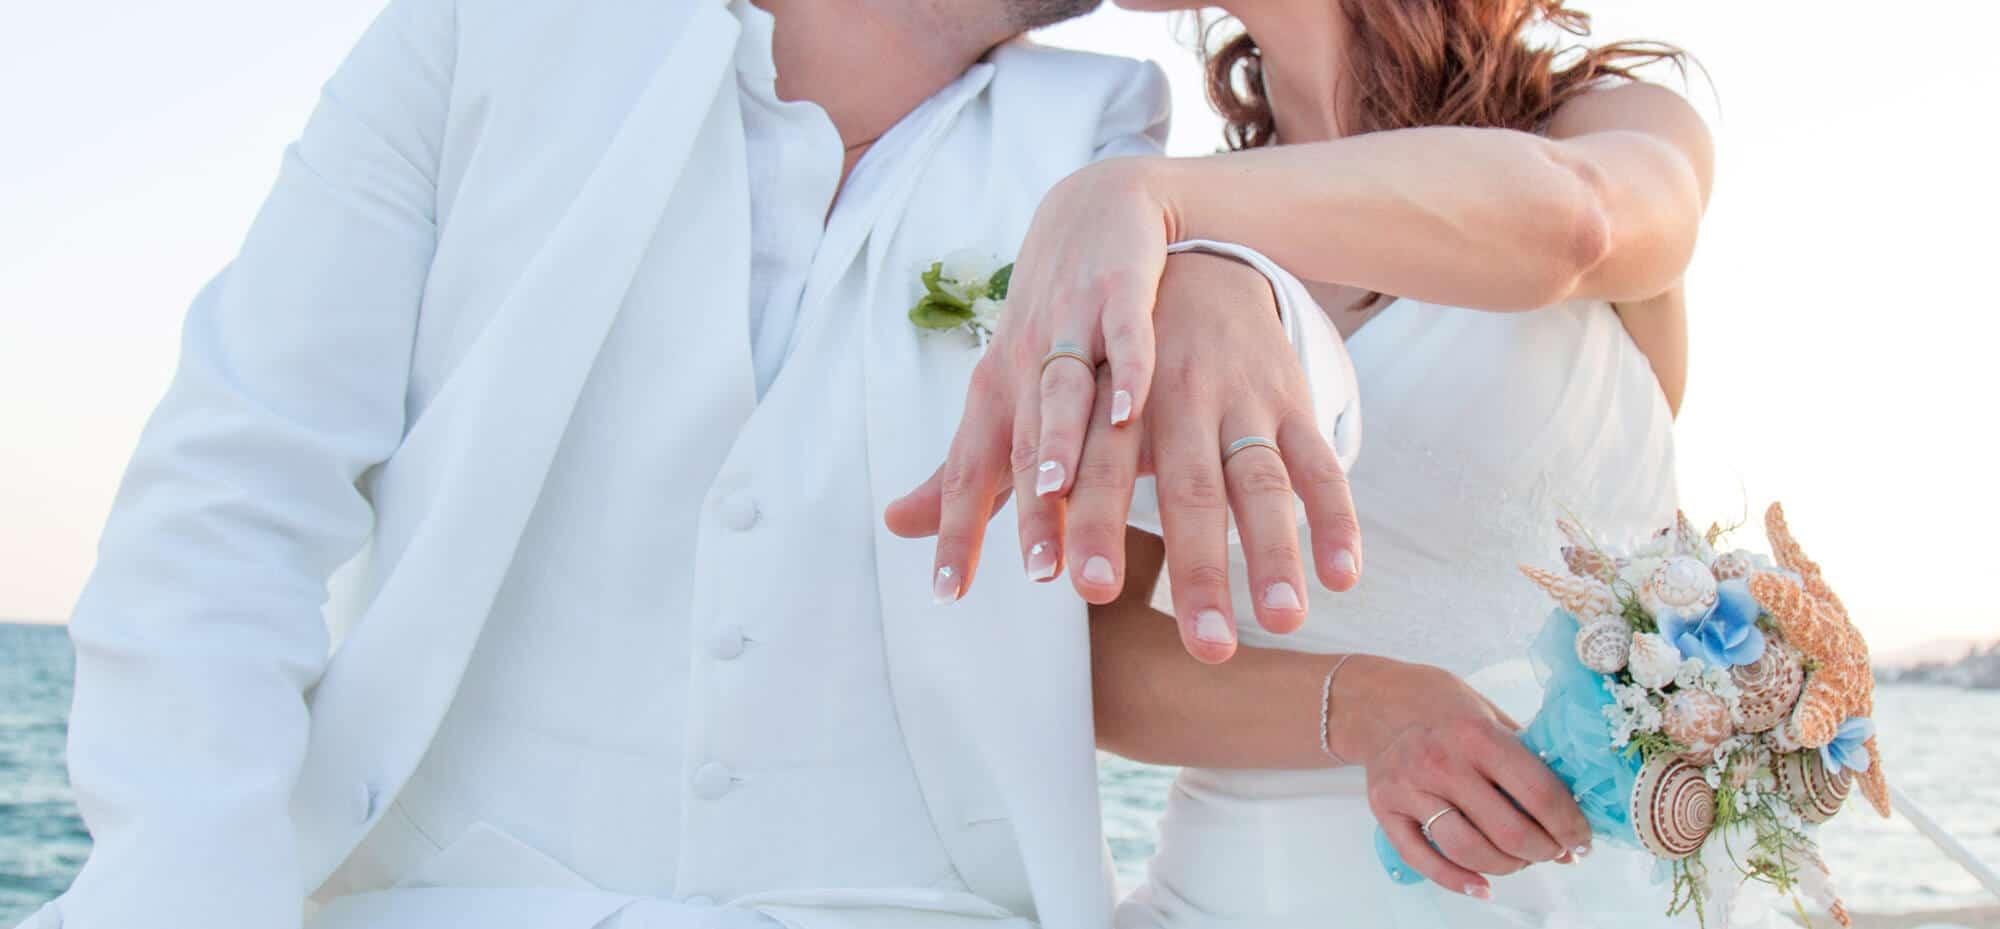 Fotógrafo de bodas en Granollers